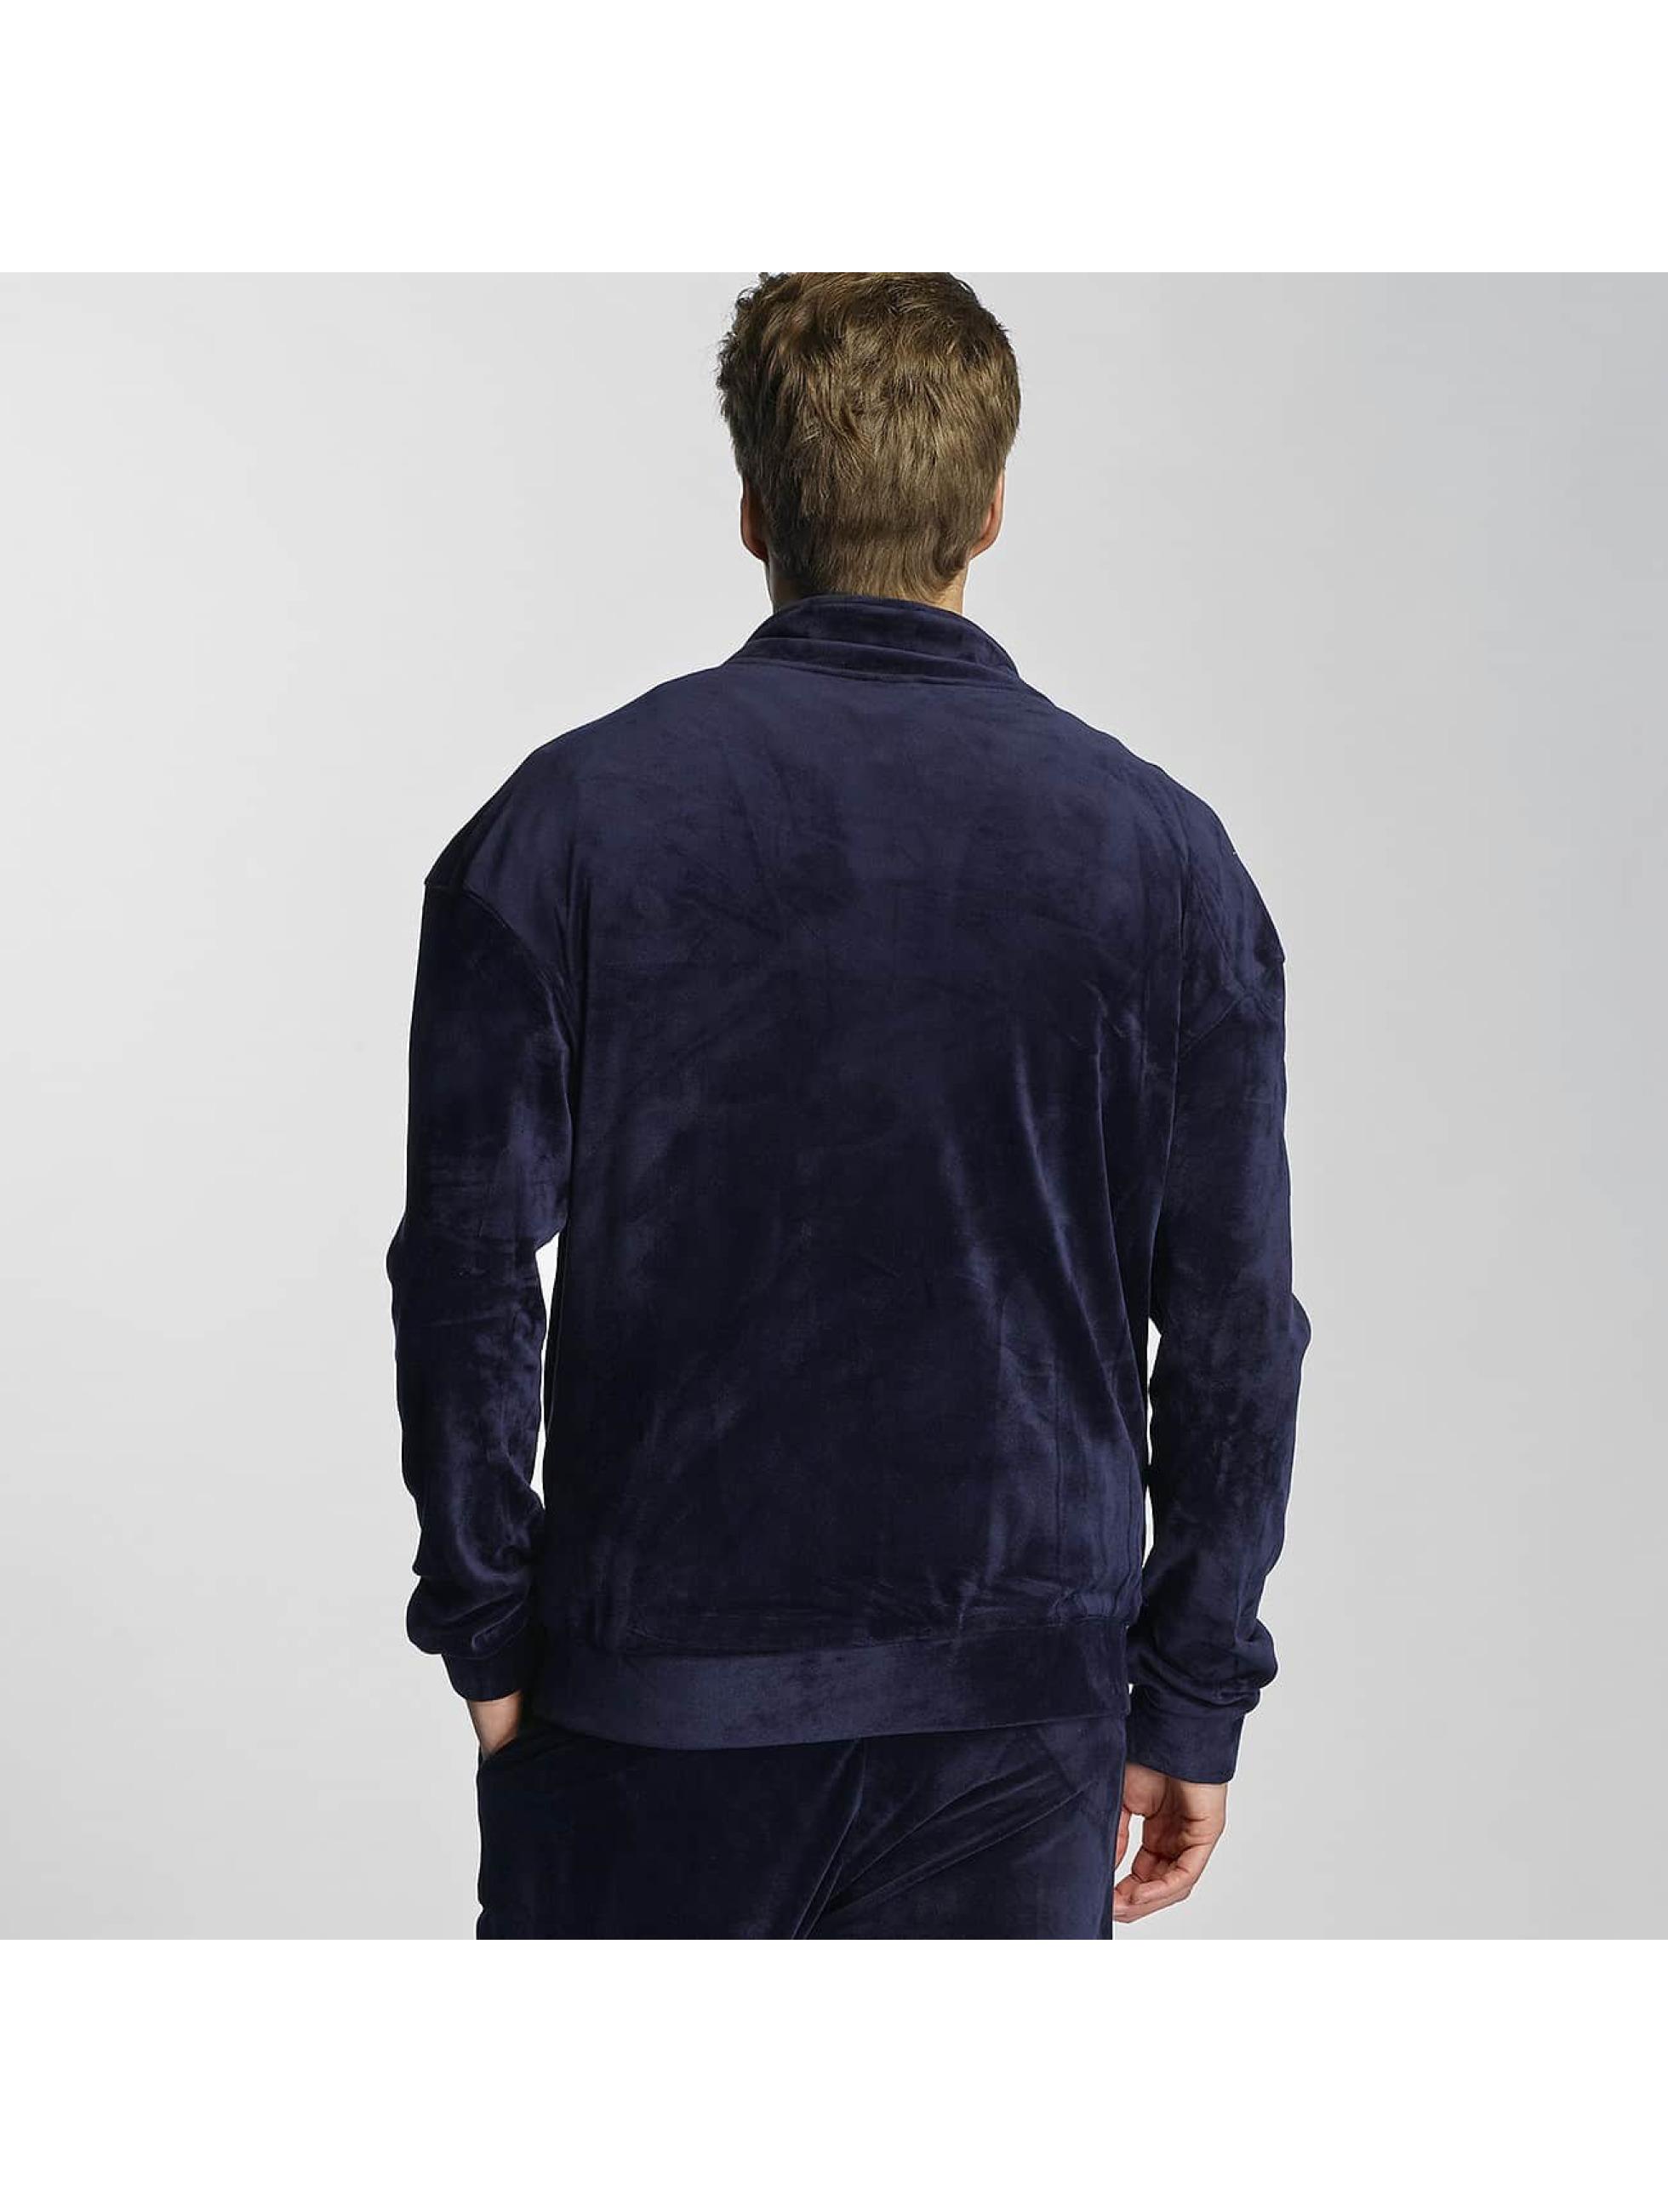 Urban Classics Lightweight Jacket Velvet blue